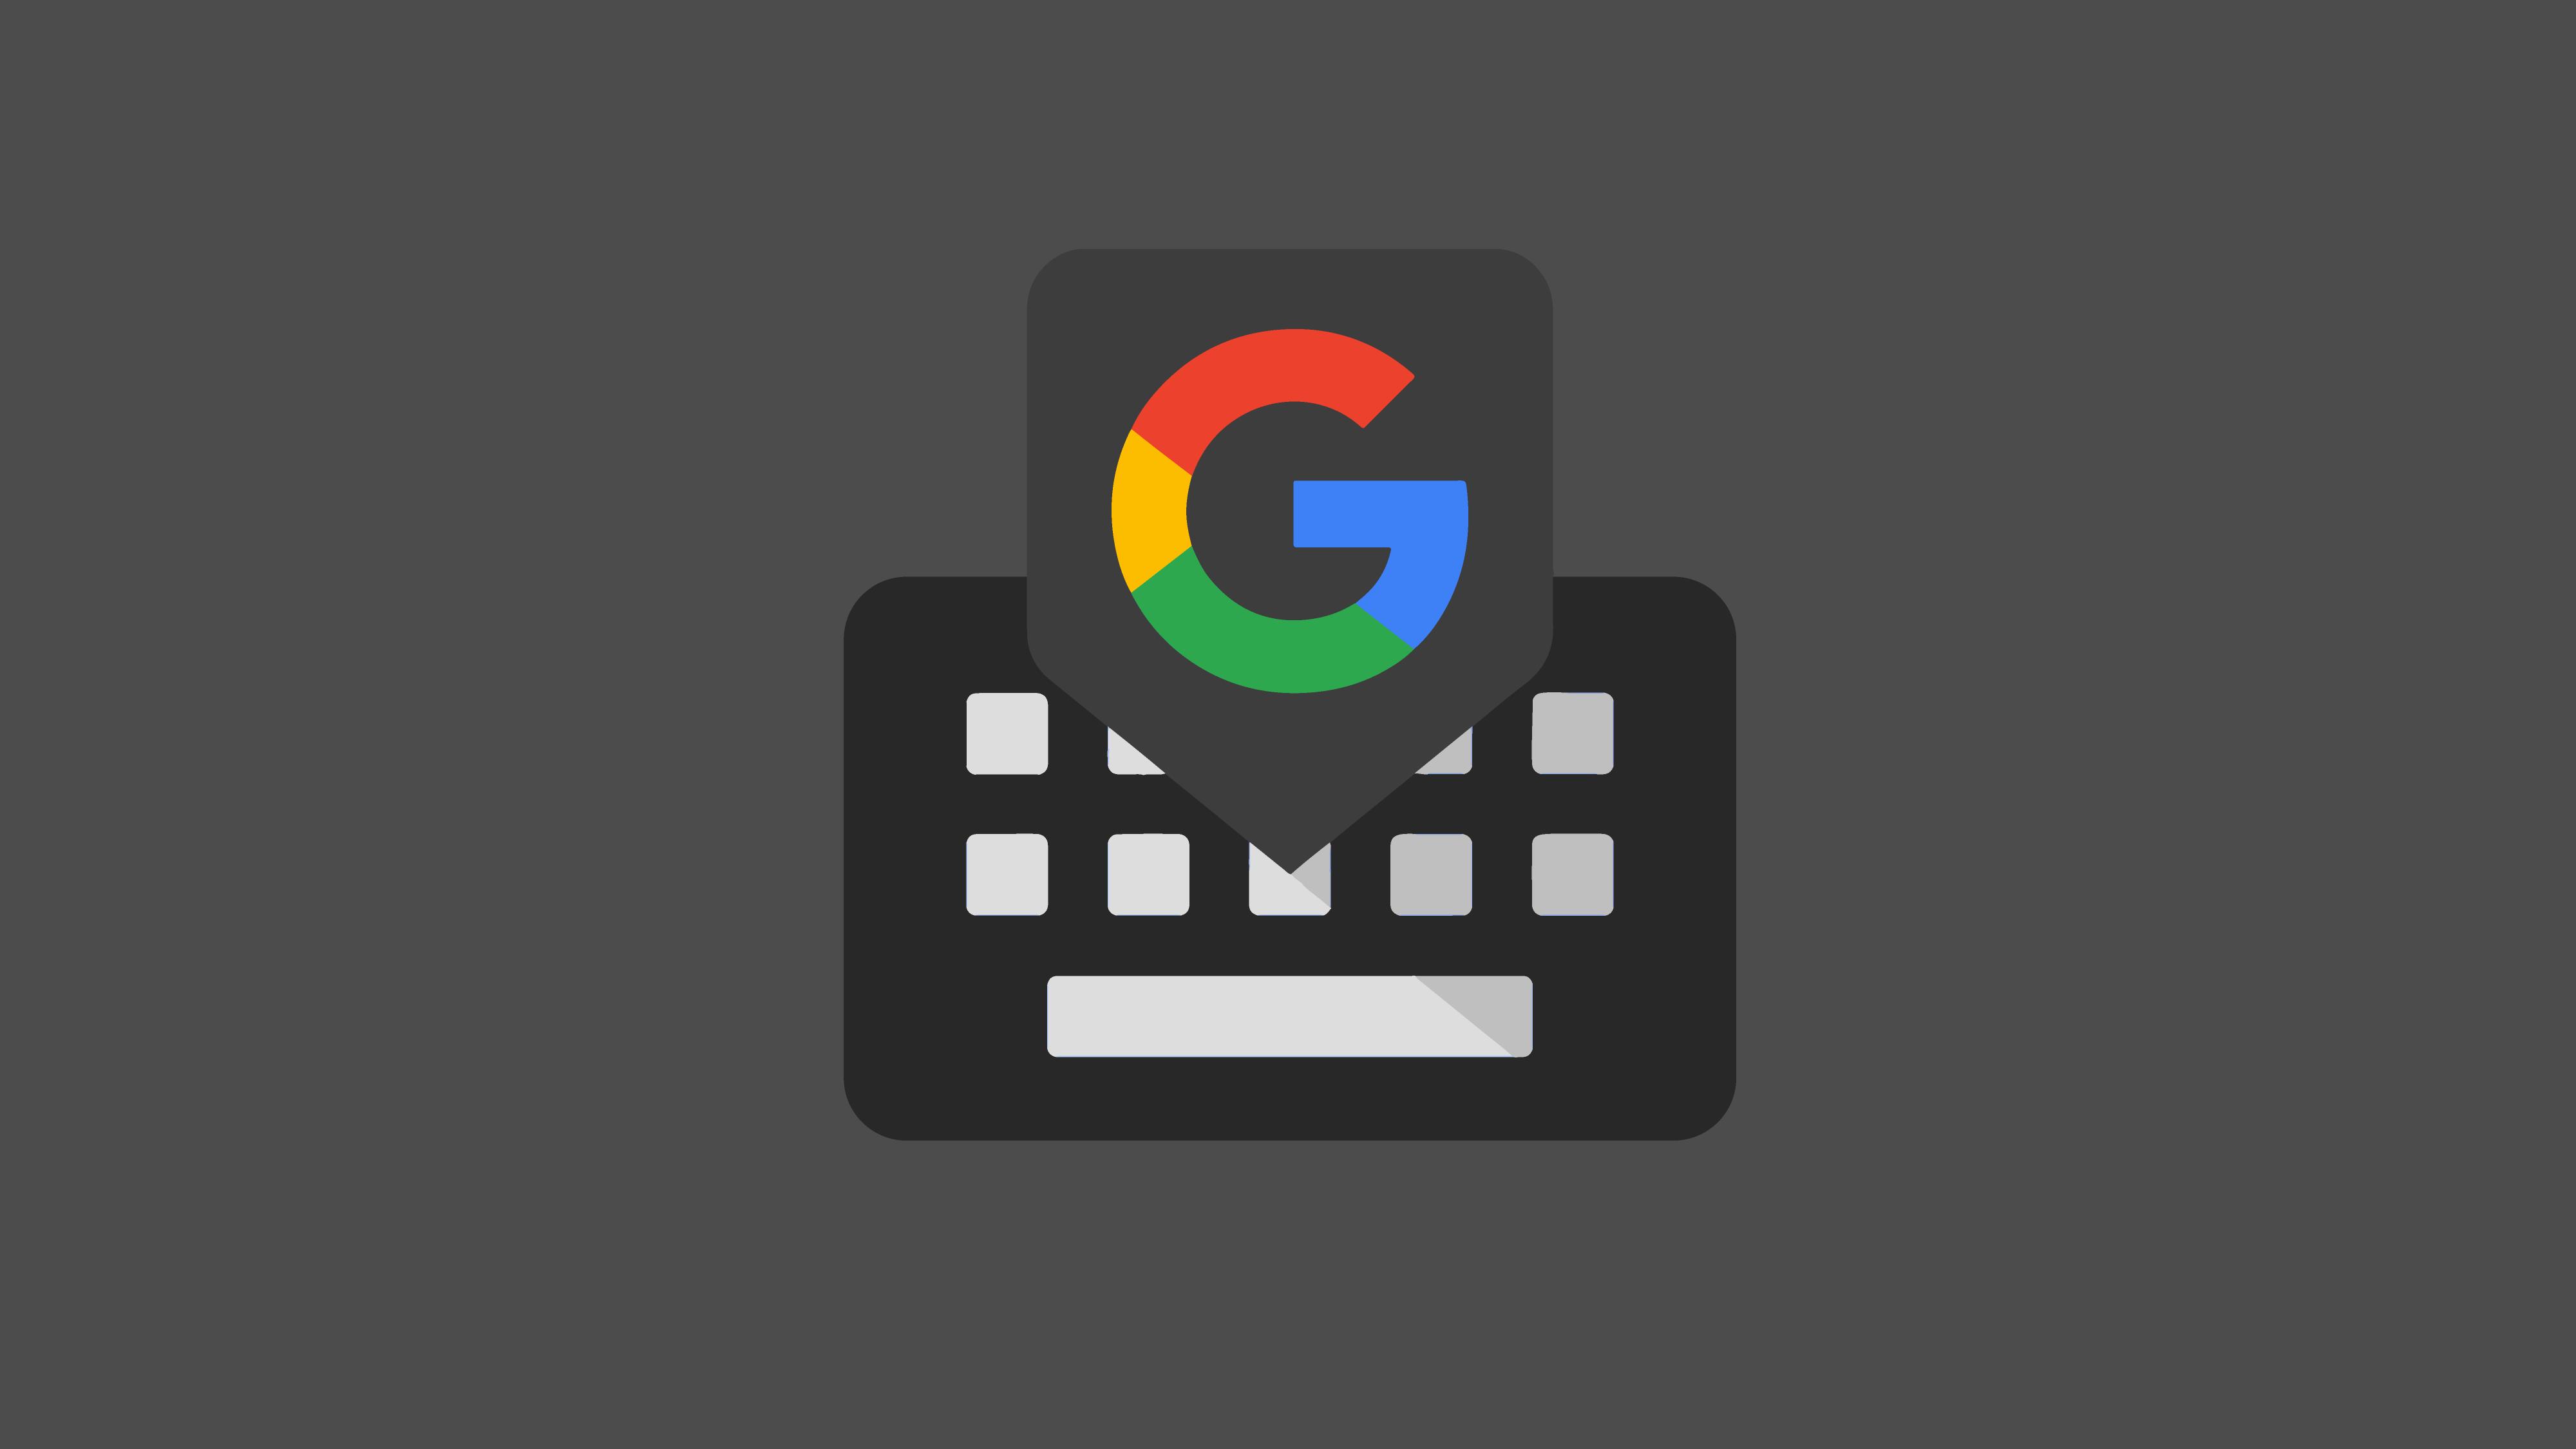 Google si diverte a testare i suggerimenti più svariati su GBoard: smart replay, emoji, sticker, GIF... (foto)